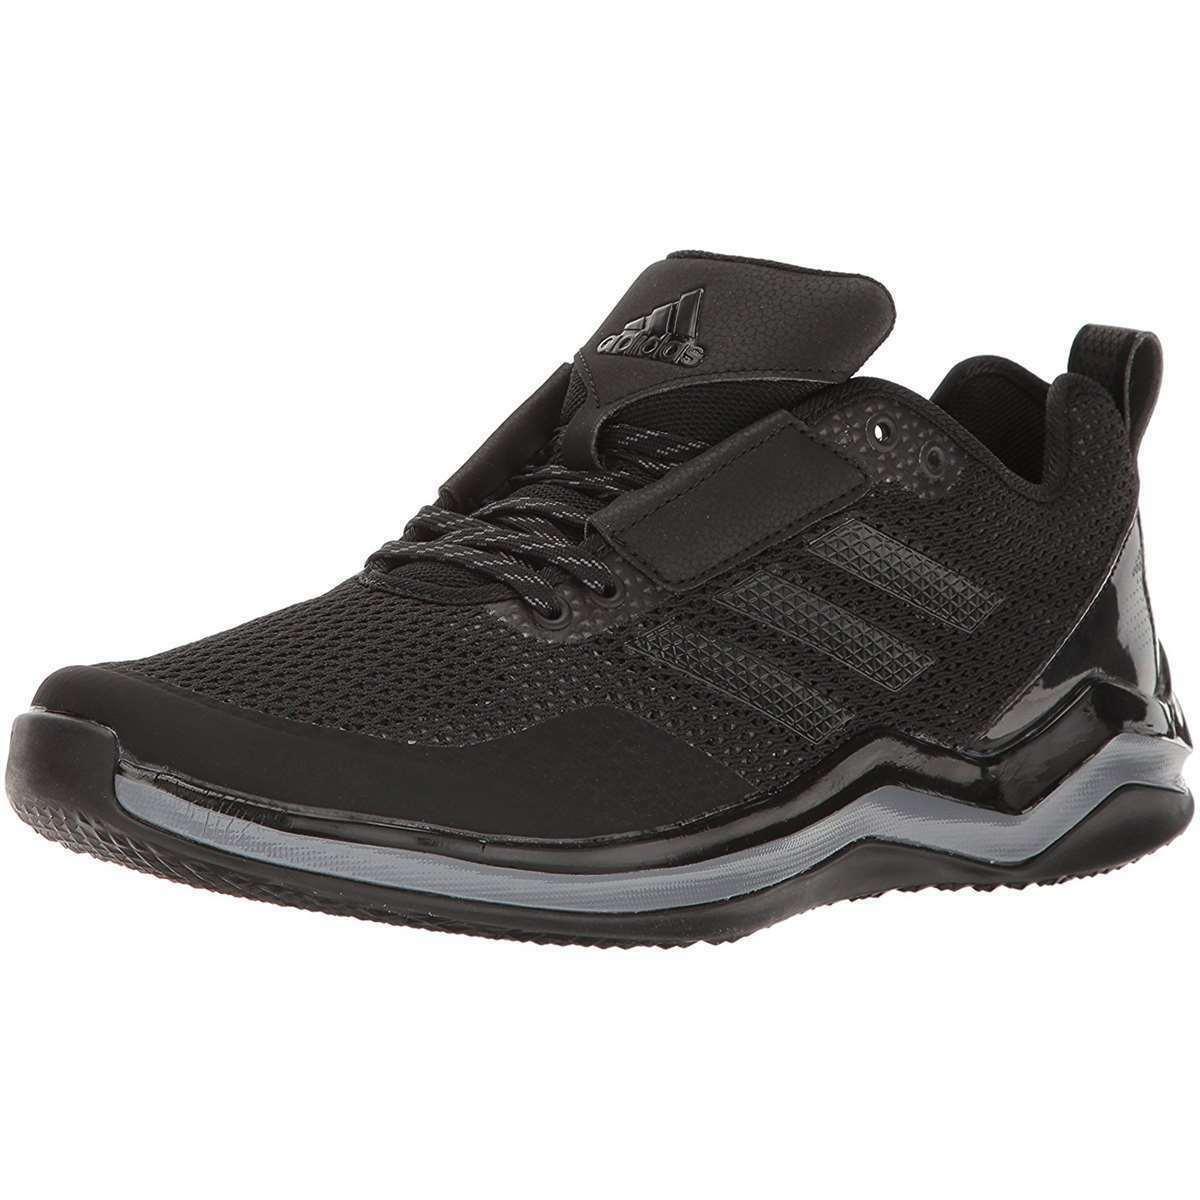 Adidas Men's Speed Trainer 3.0 Black Ironmt Baseball shoes Training Sneakers NEW